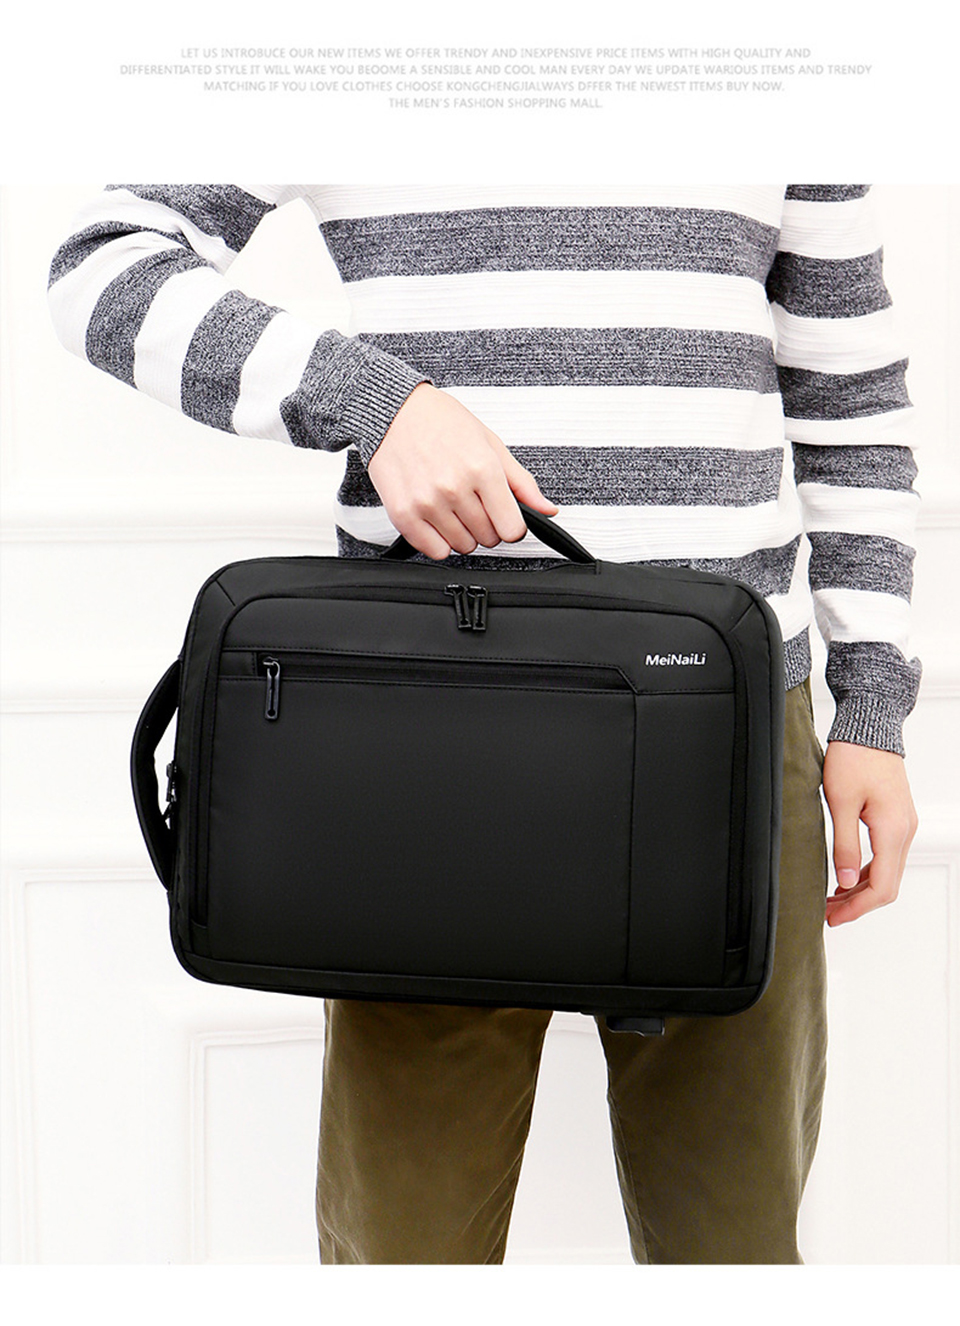 14 Multifunction USB Backpack Man Bag 15.6inch Laptop Backpacks Travel Bags Large Capacity Luggage Backpacking Waterproof Notebook